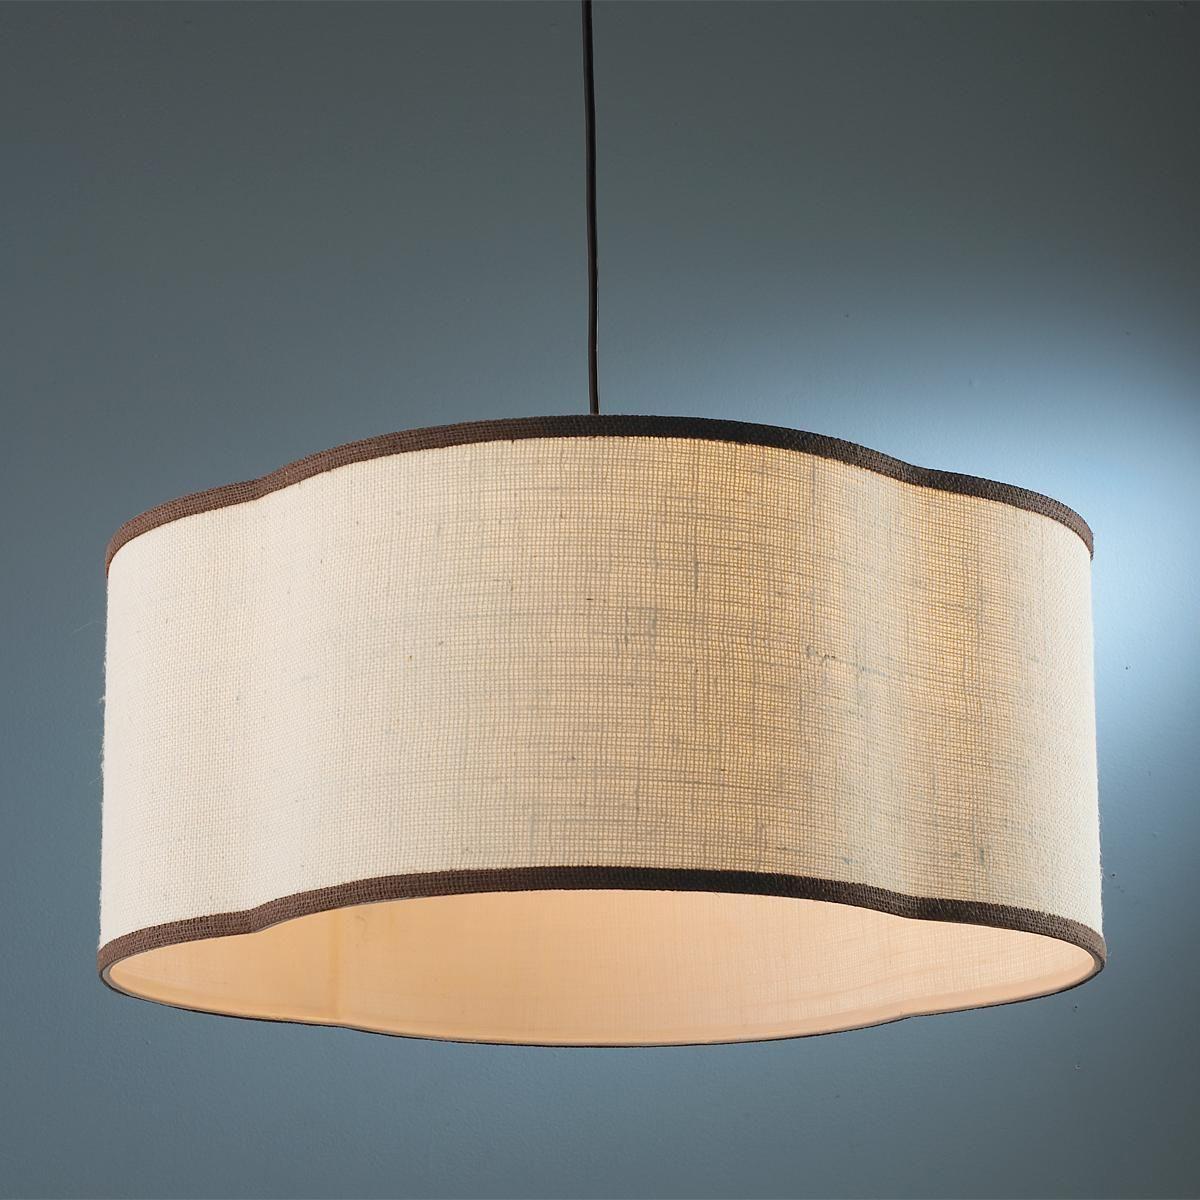 24 Quot Quatrefoil Shade Pendant Hanging Lamp Shade Large